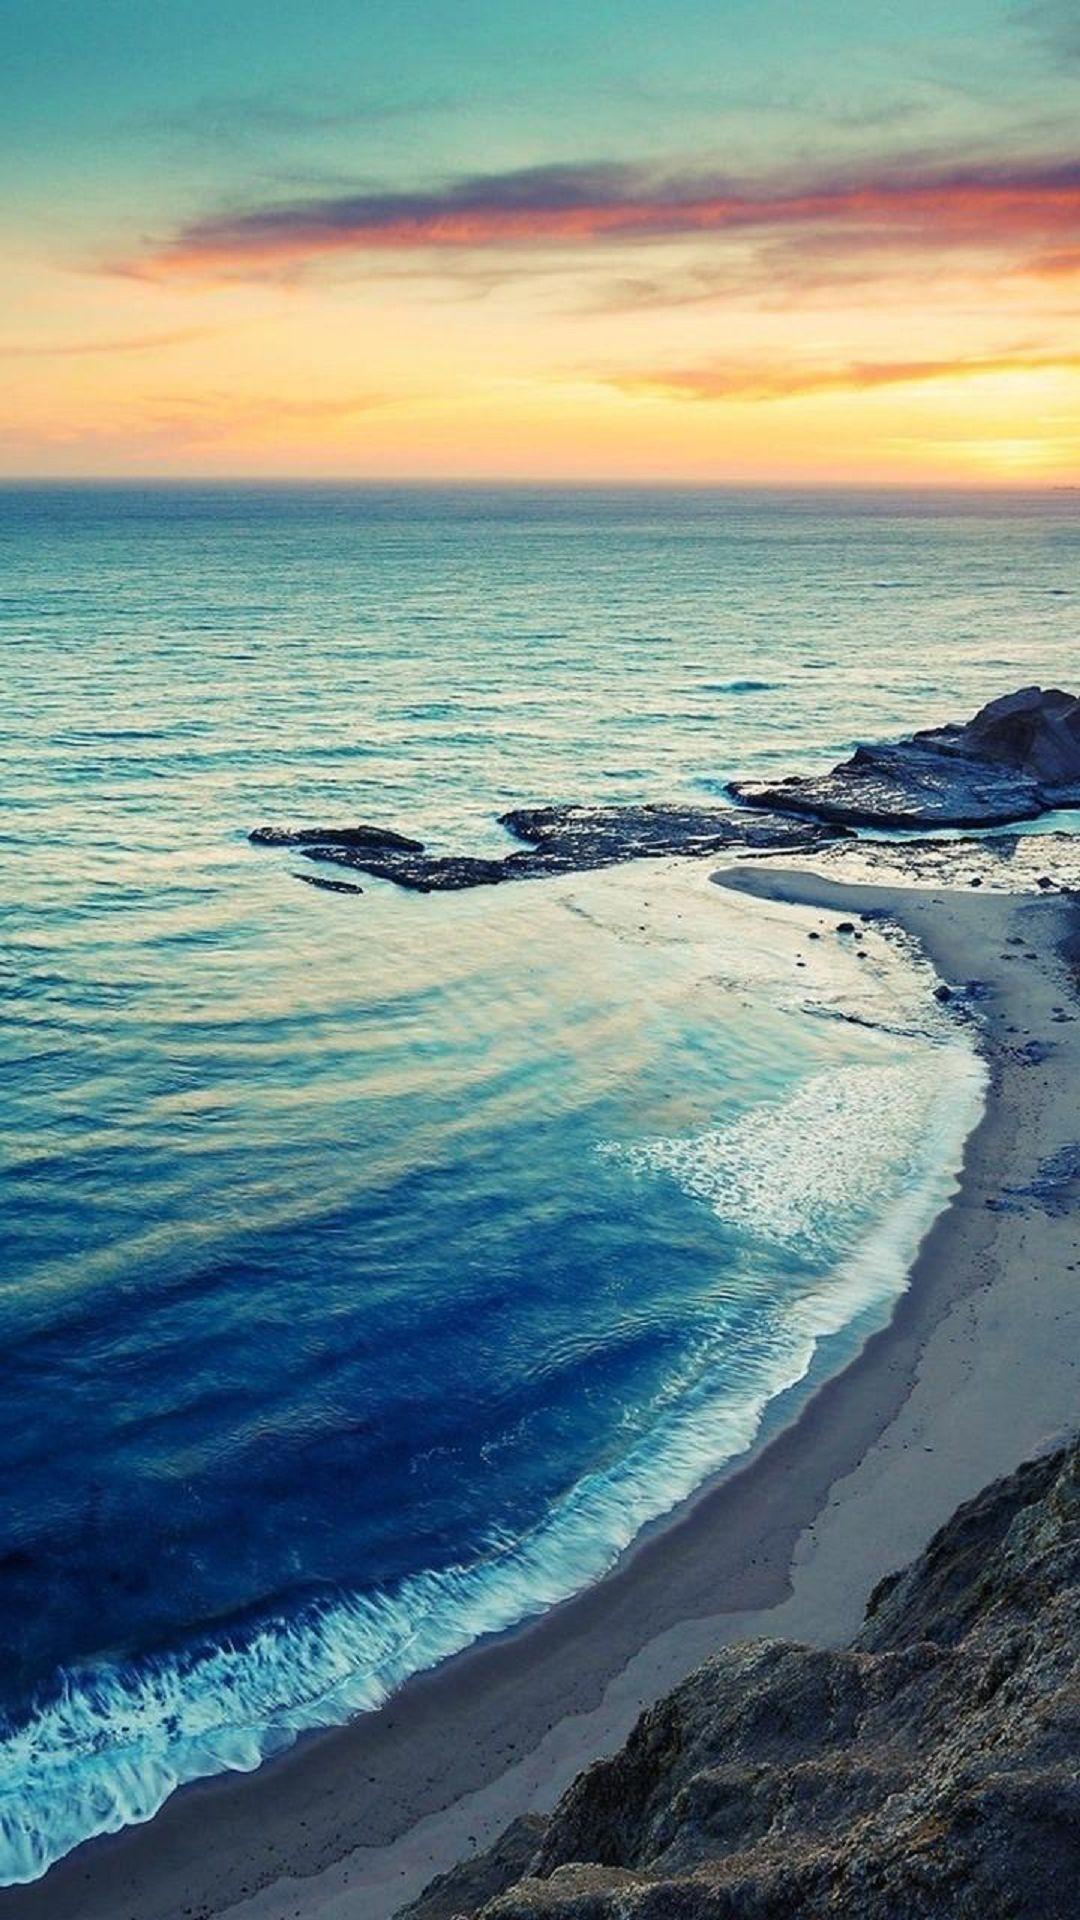 Sunrise Beach Seaside Coast iPhone 6 Plus HD Wallpaper …